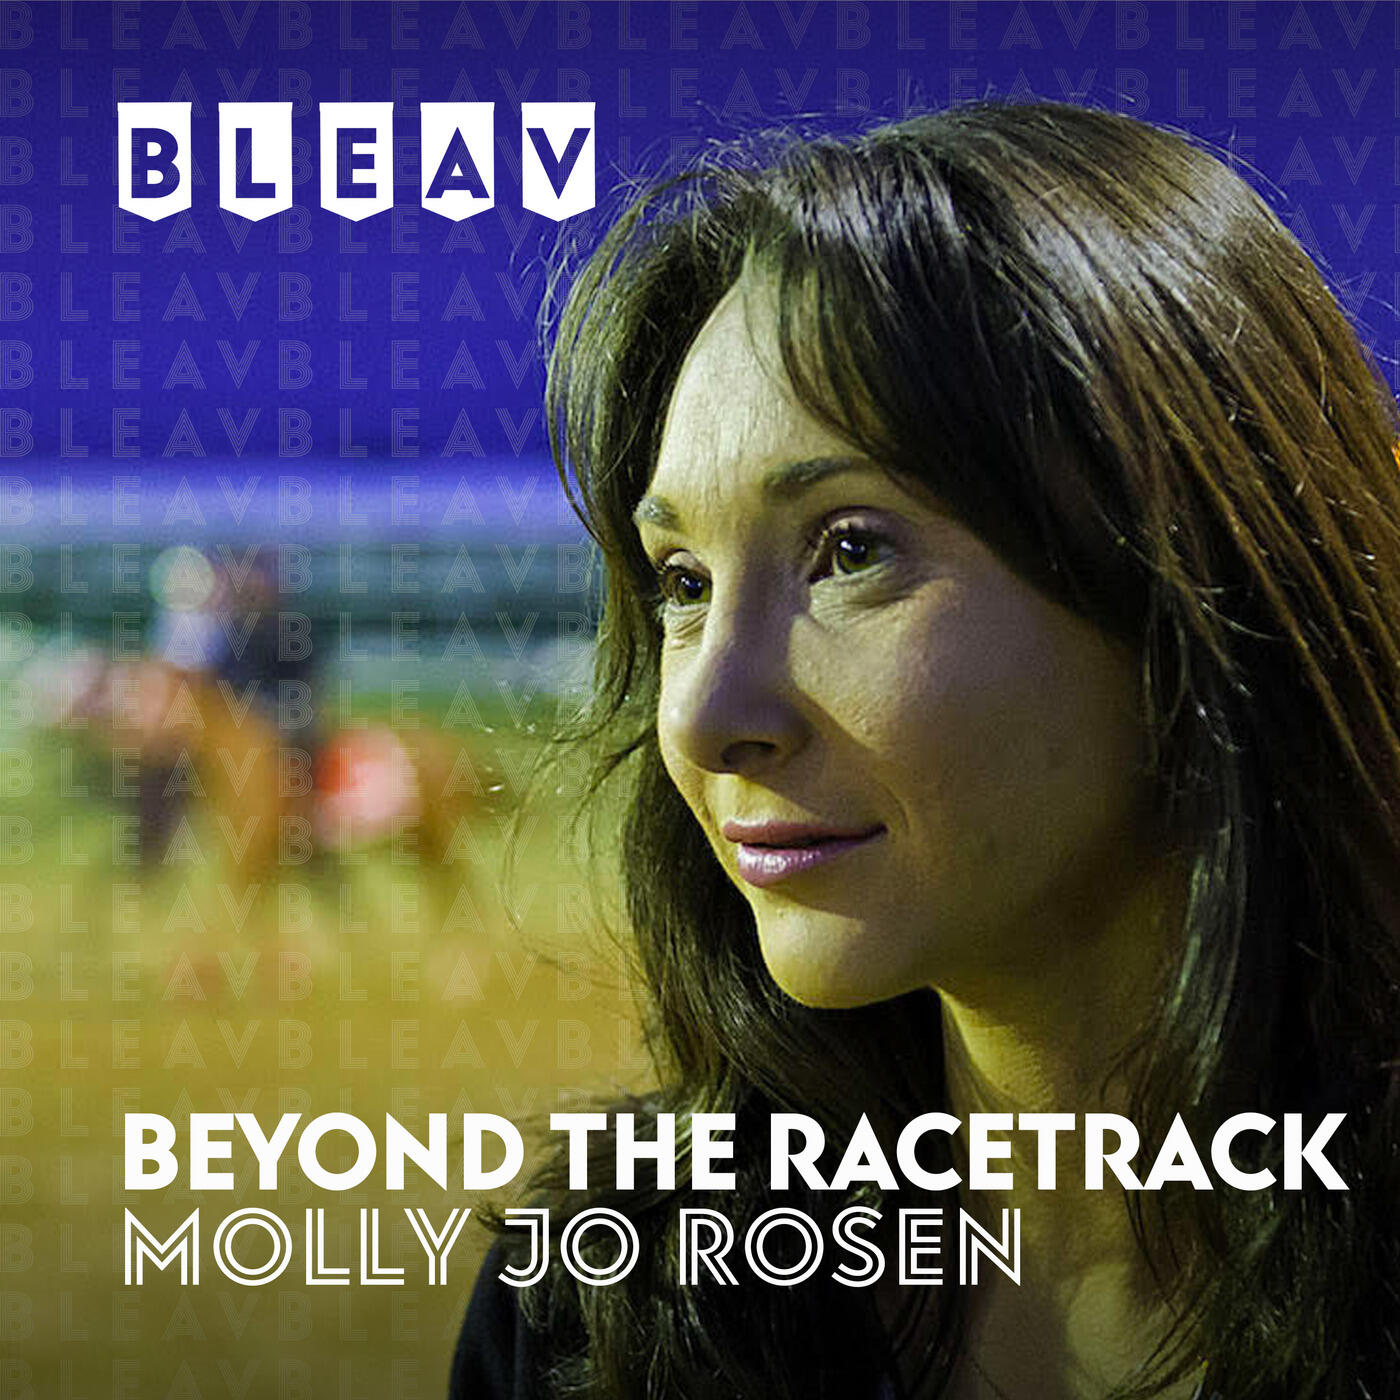 Bleav in Beyond The Racetrack